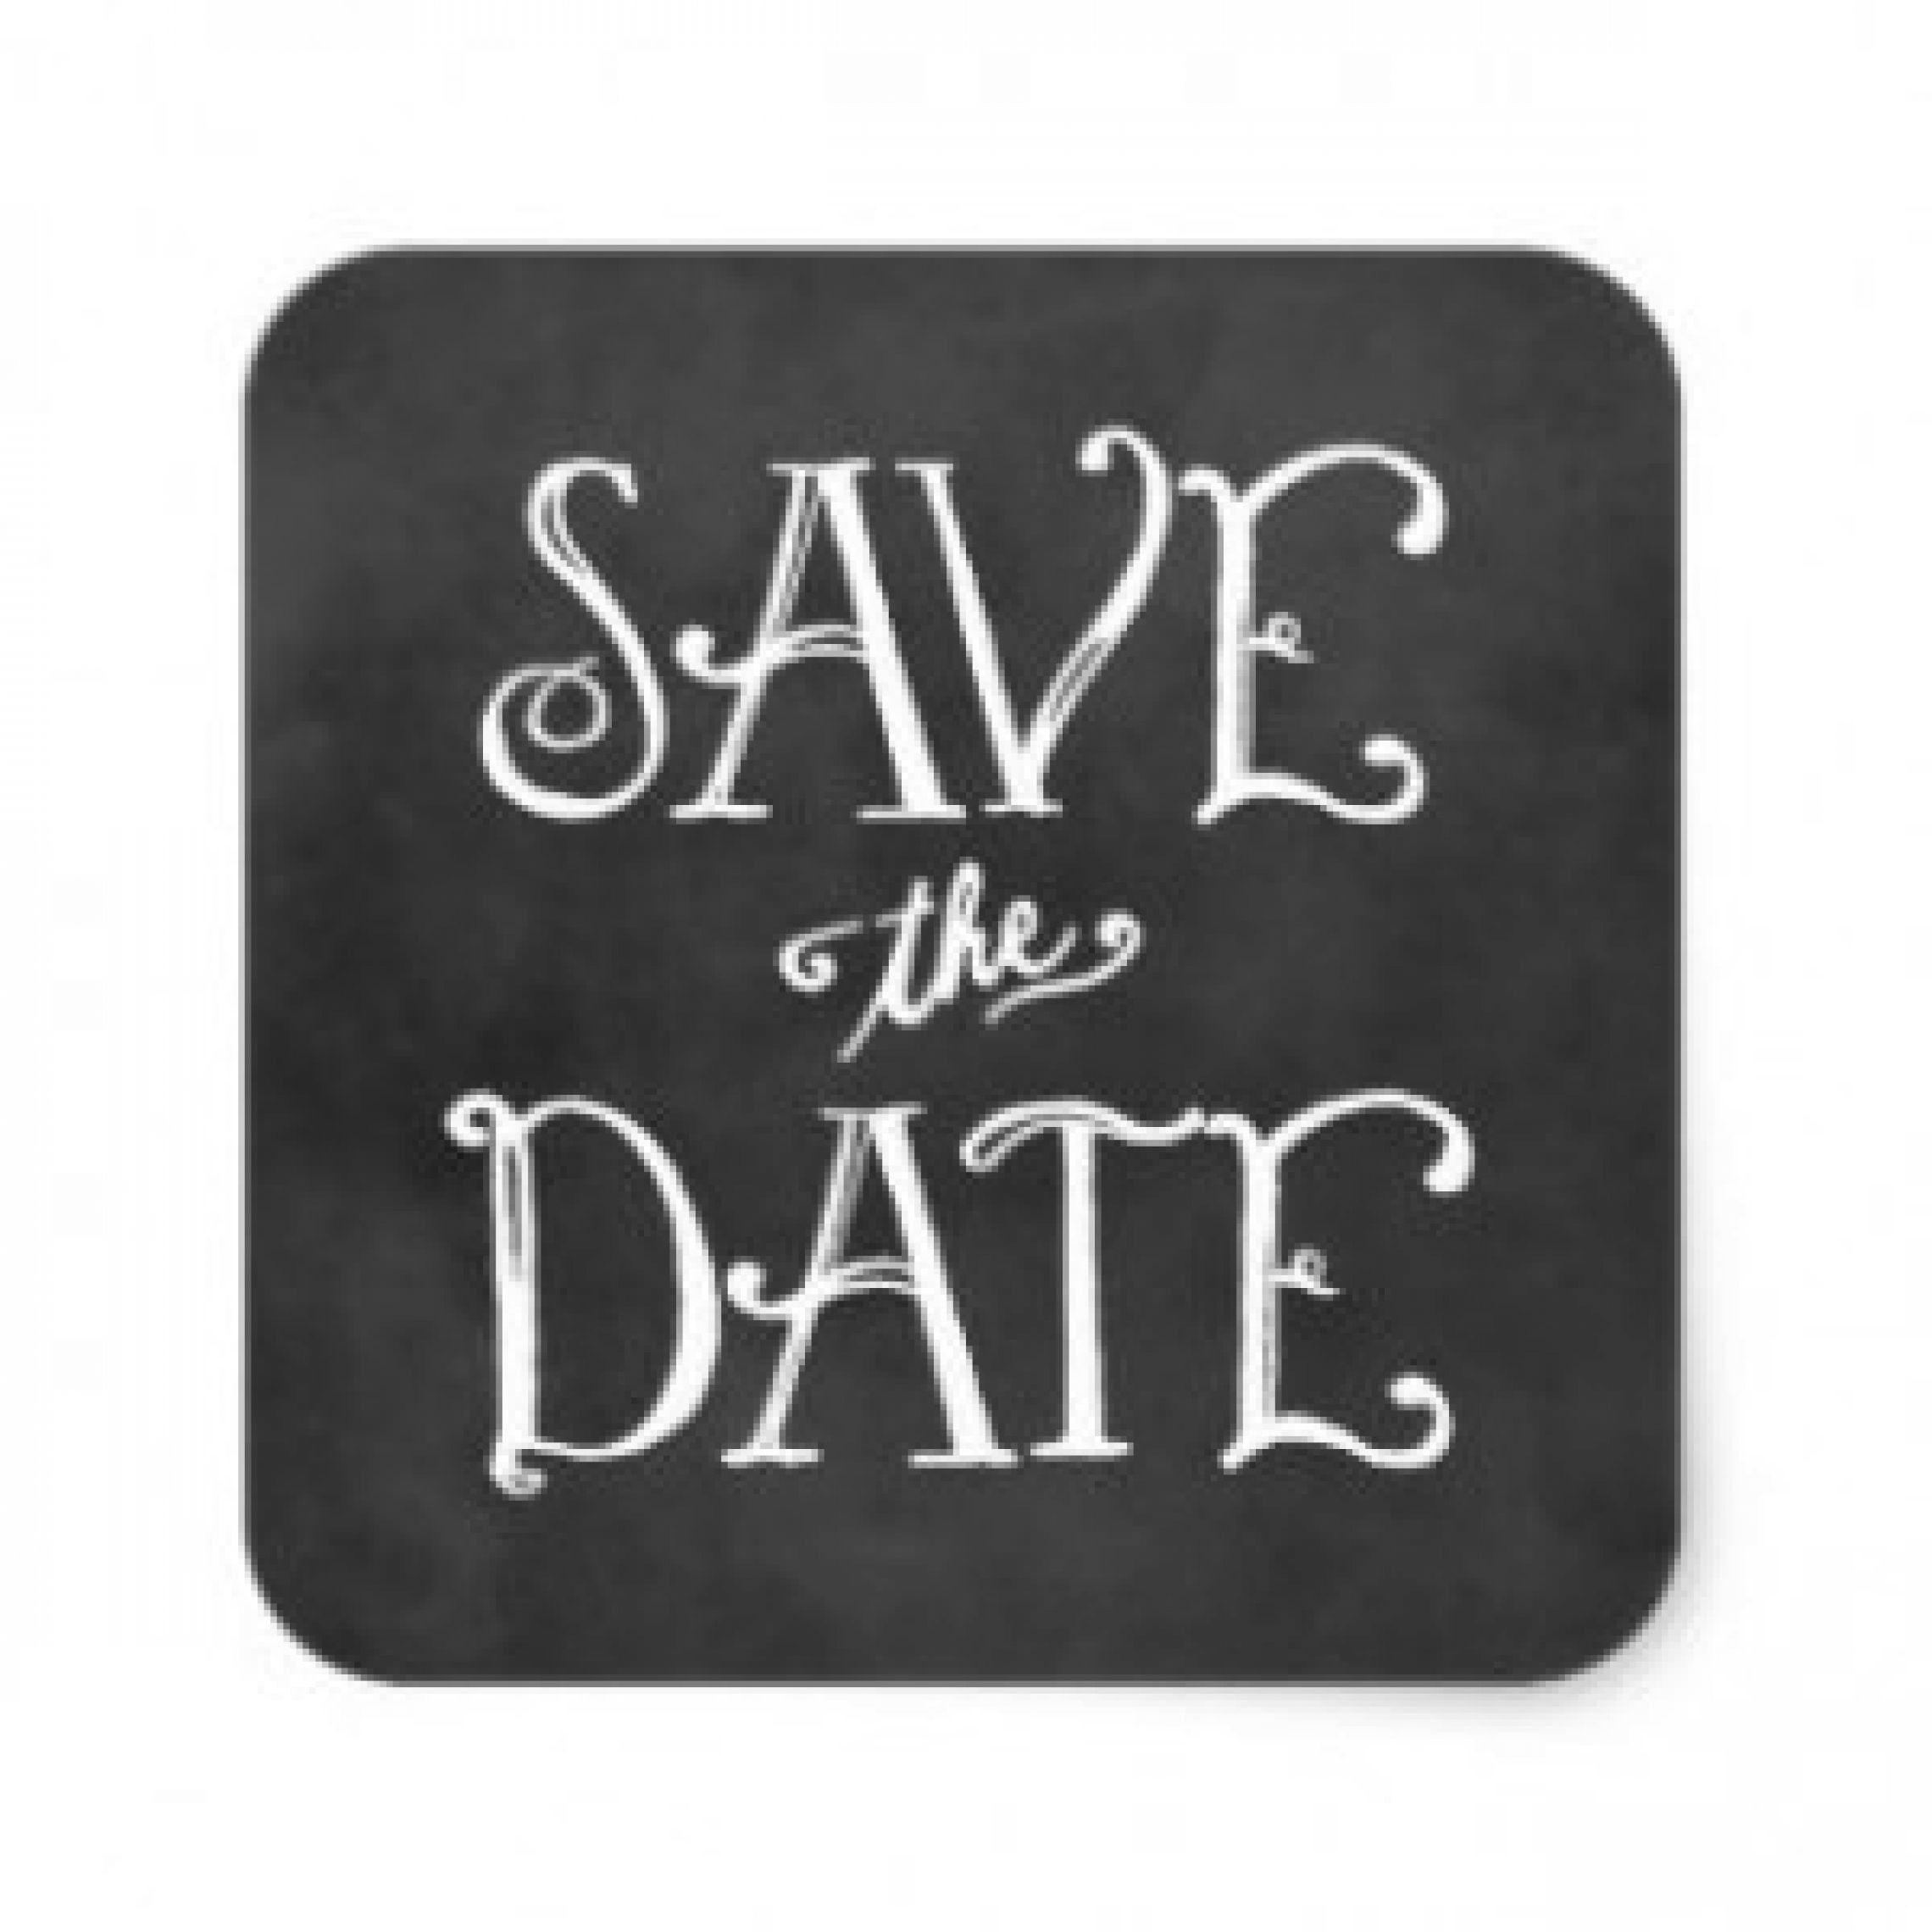 Wmu Calendar 2020 WMU of Texas   WMU of Texas Calendar